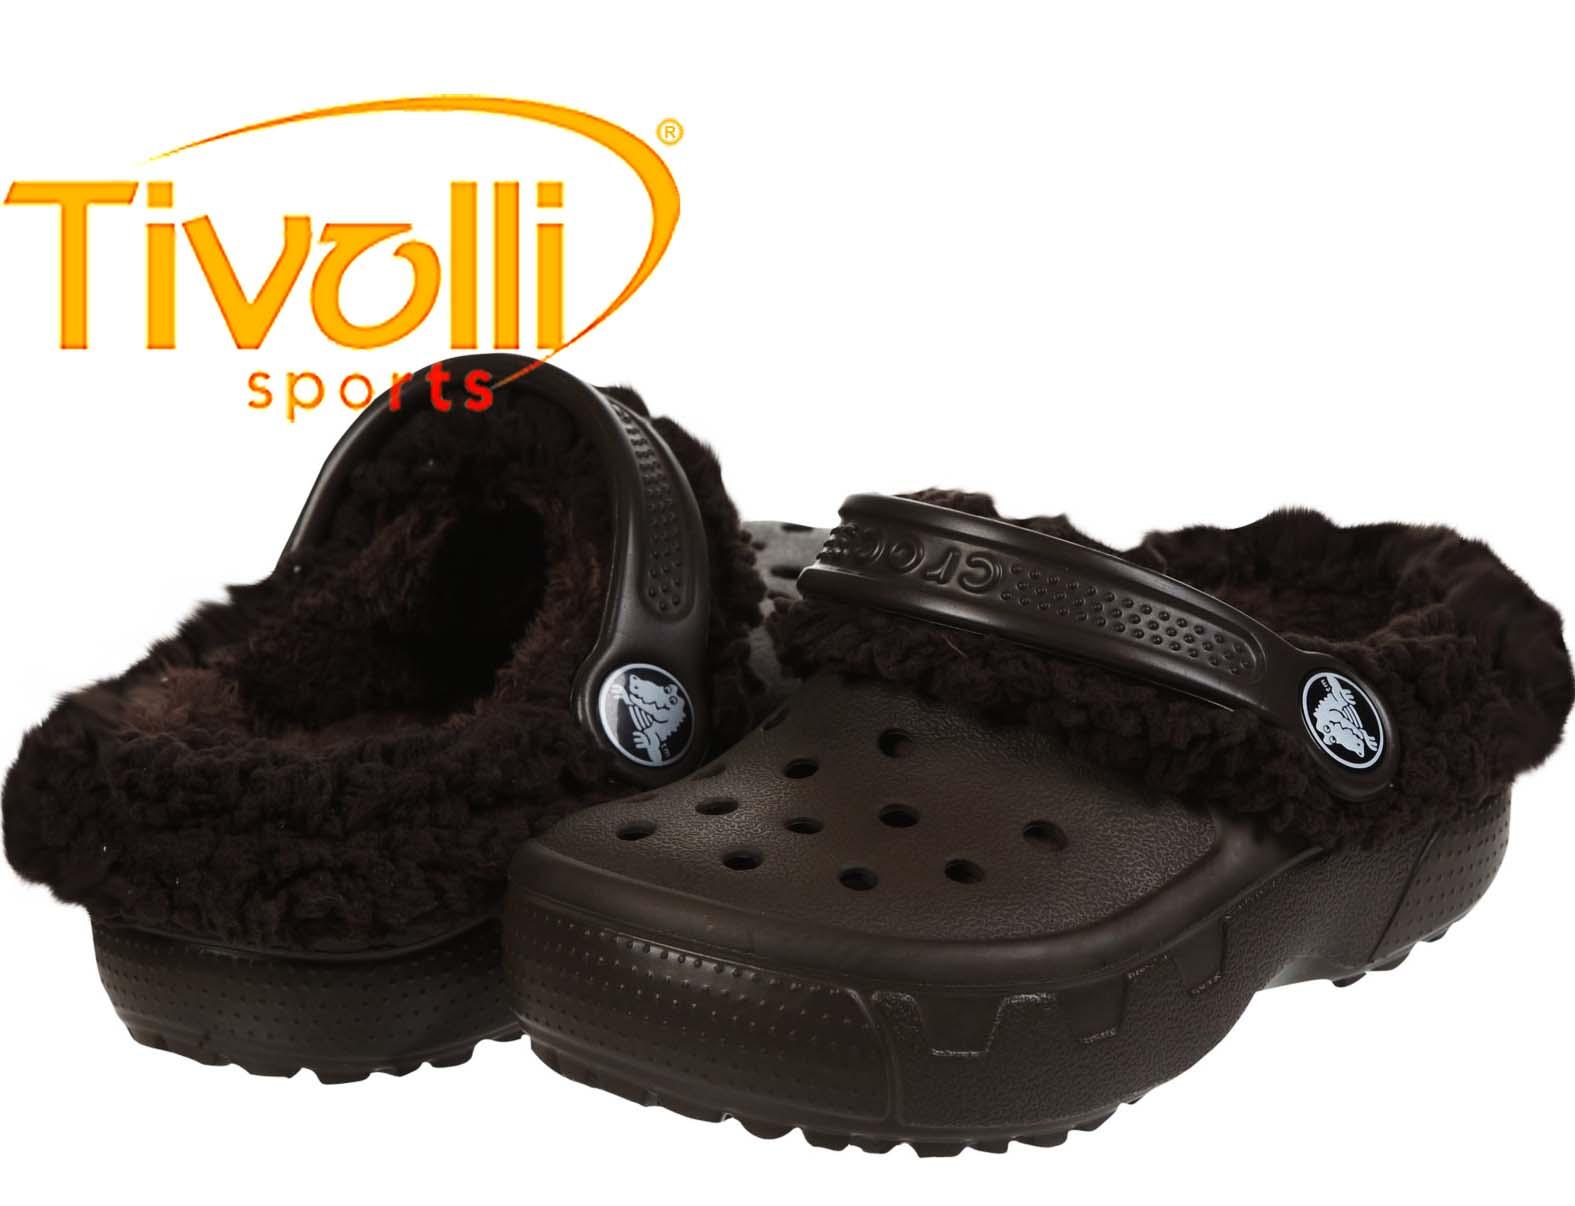 af2394f1b0228 Crocs Mammoth EVO Clog Infantil   Marrom Espresso